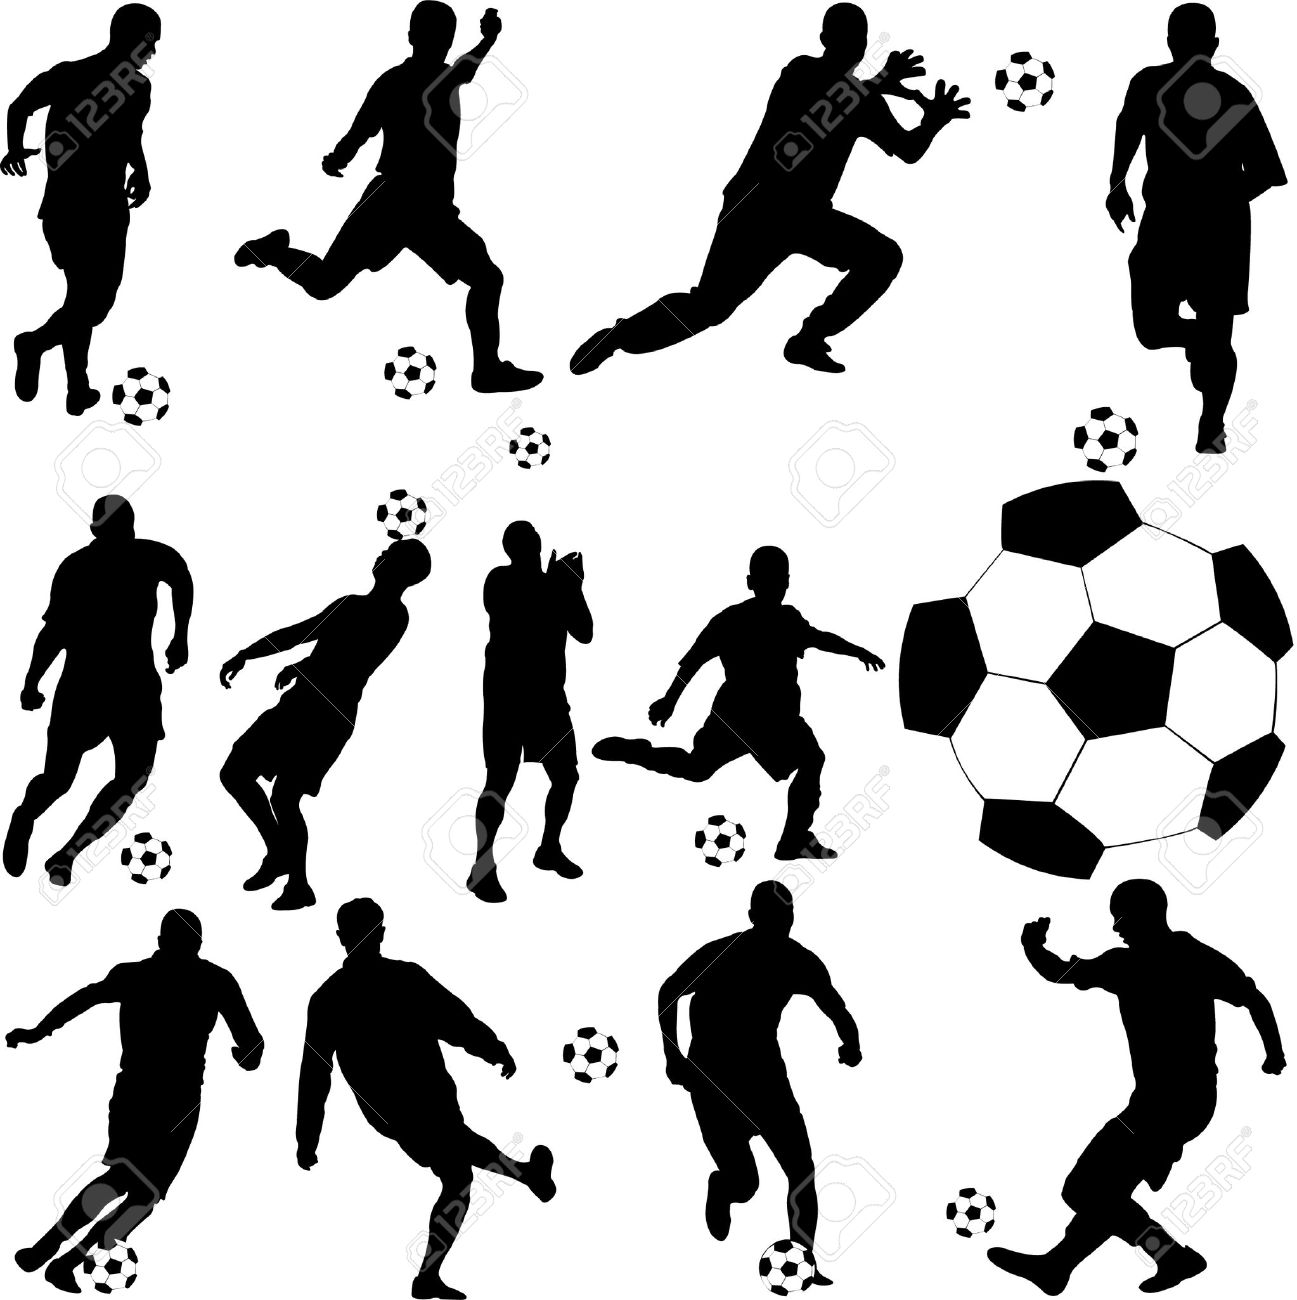 soccer player vector Stock Vector - 8285947